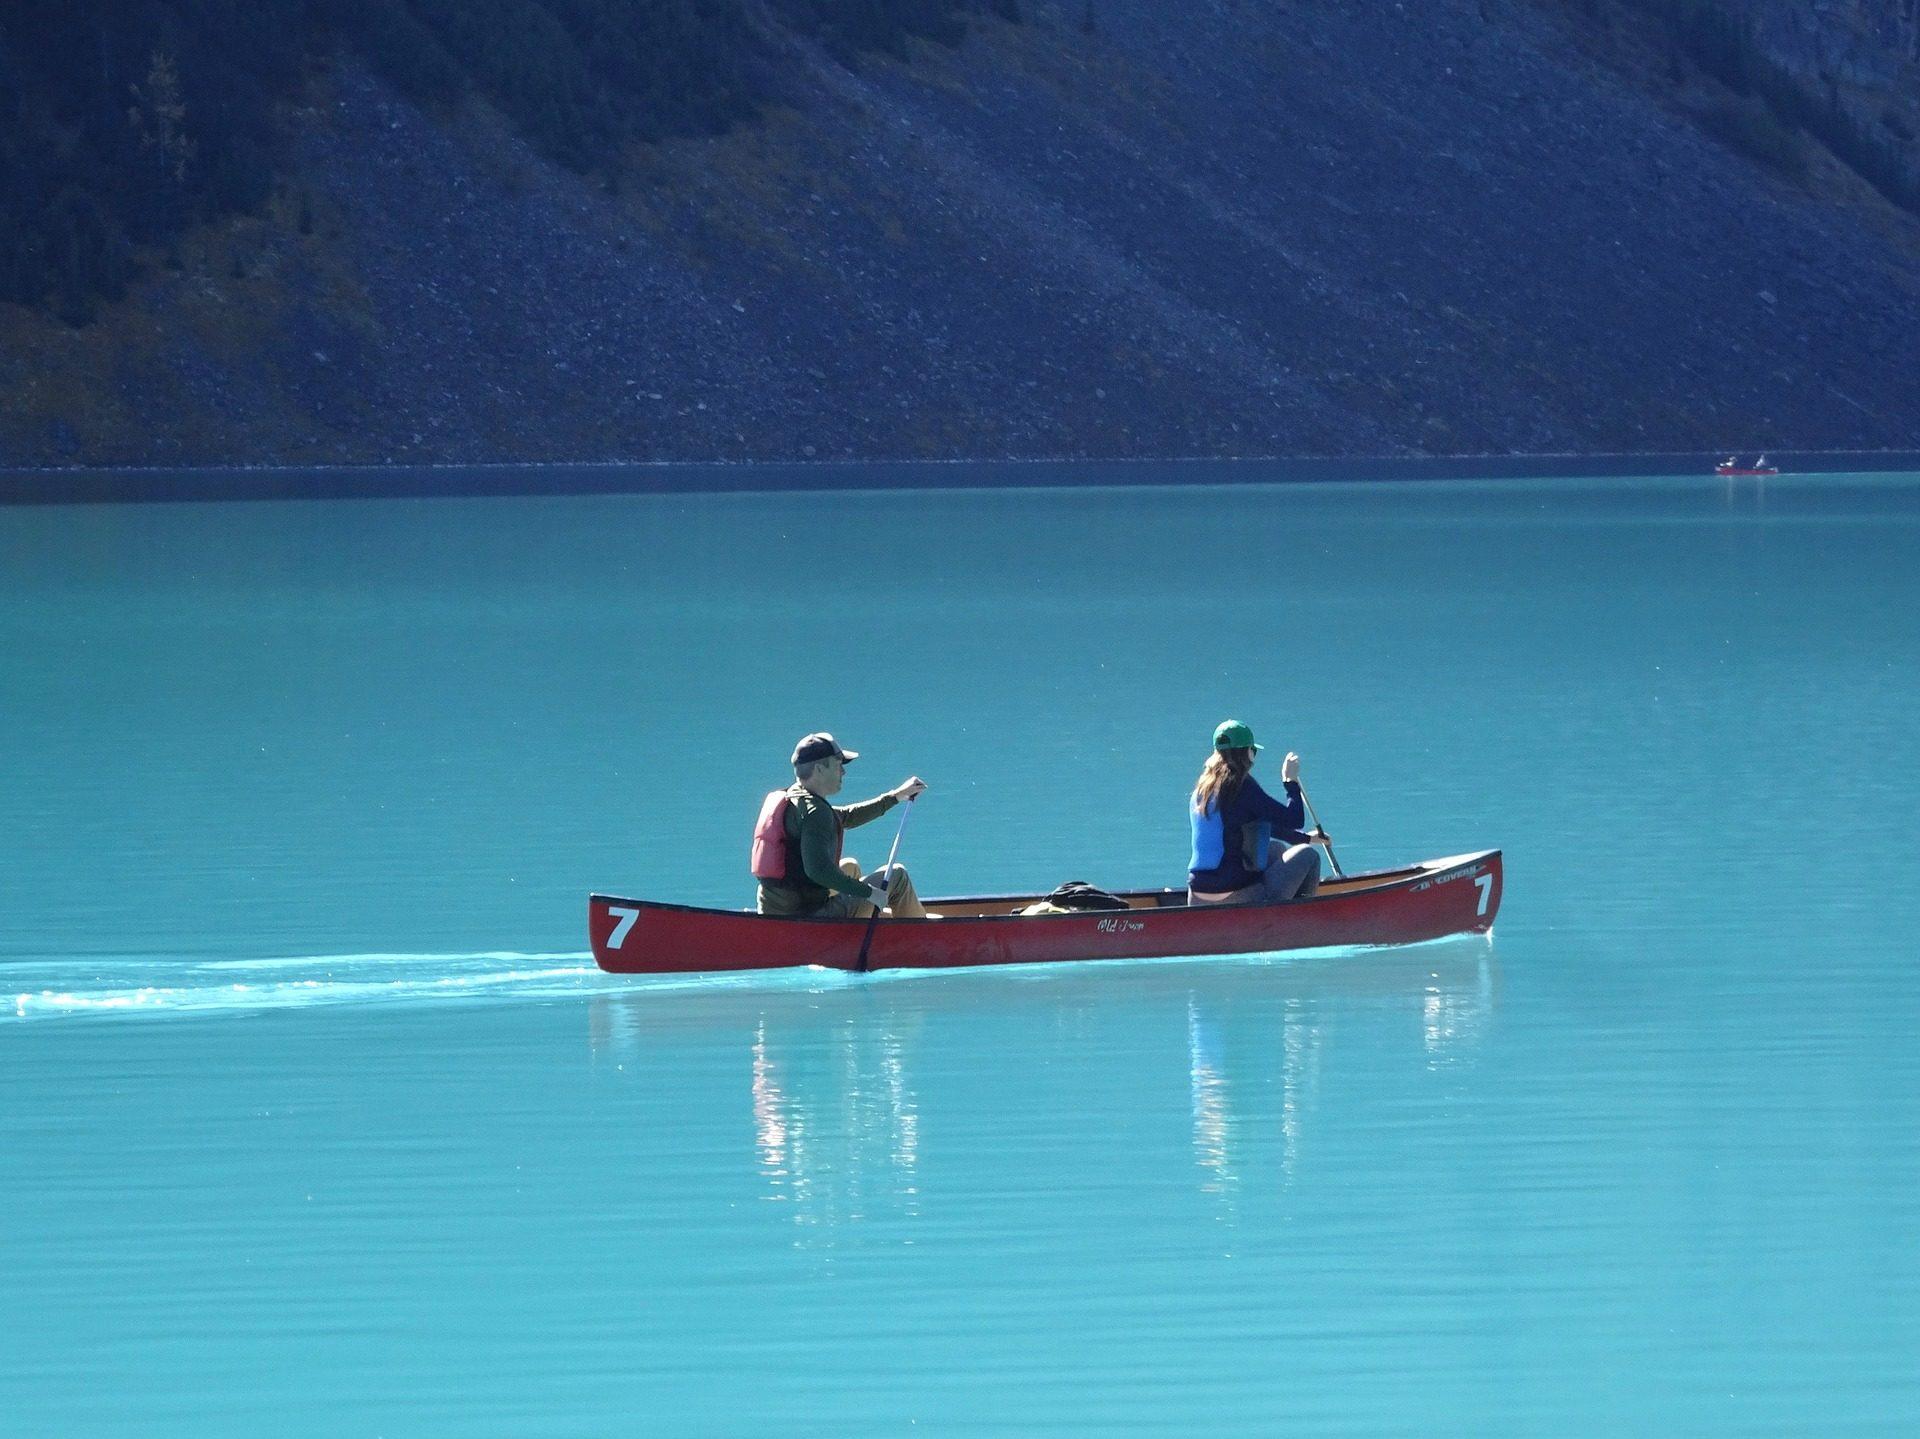 canoa, pareja, lago, esmeralda, louise, canadá, montañas - Fondos de Pantalla HD - professor-falken.com